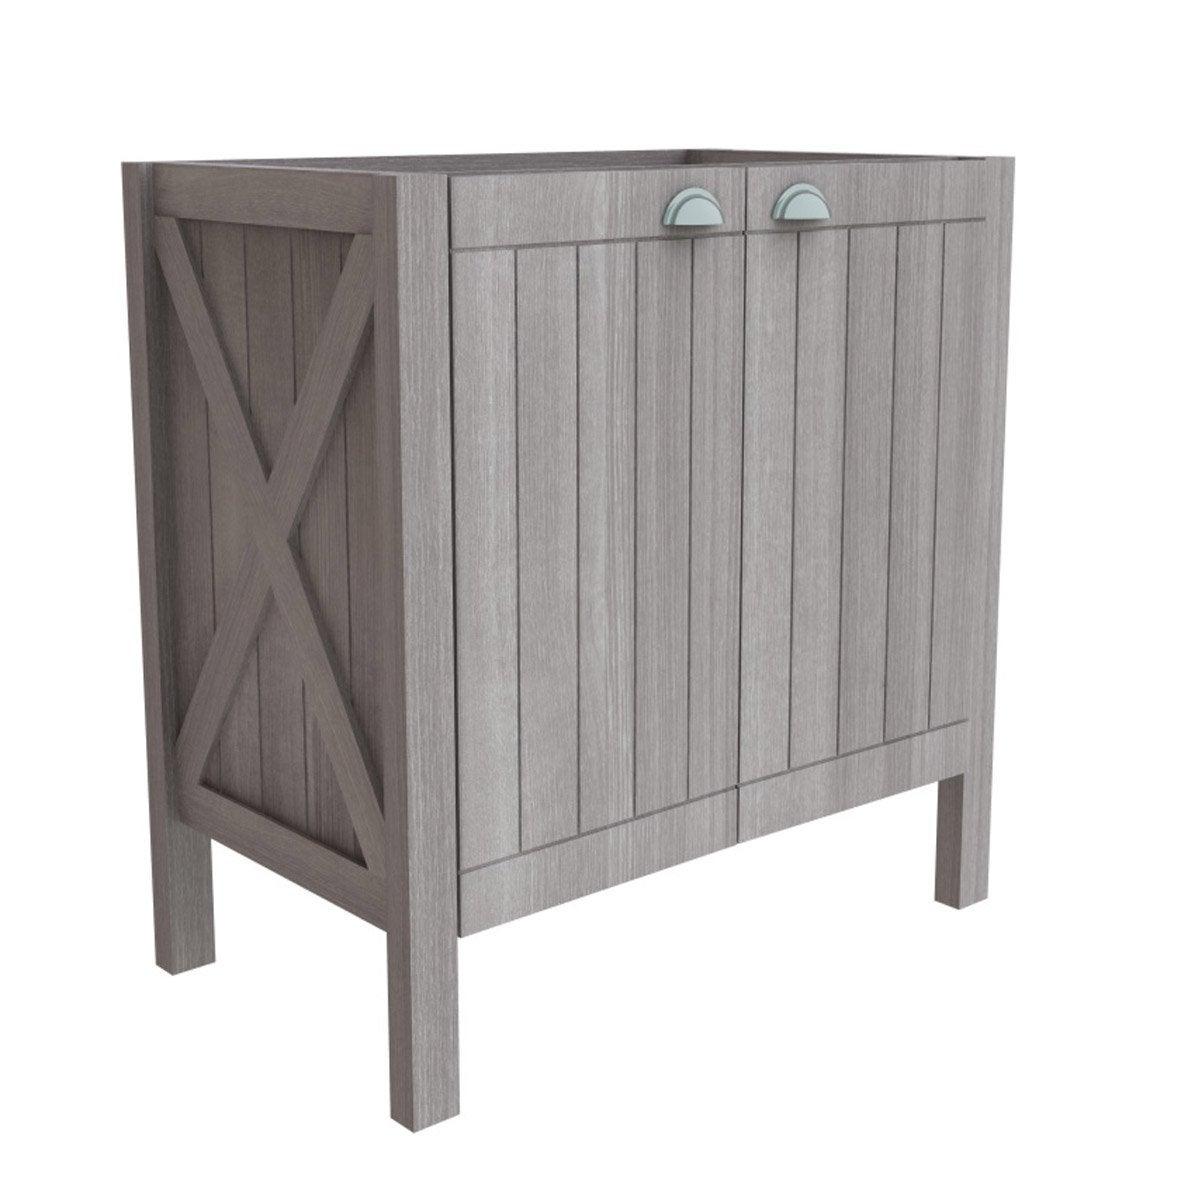 meuble sous vasque long island gris 2 portes leroy merlin. Black Bedroom Furniture Sets. Home Design Ideas